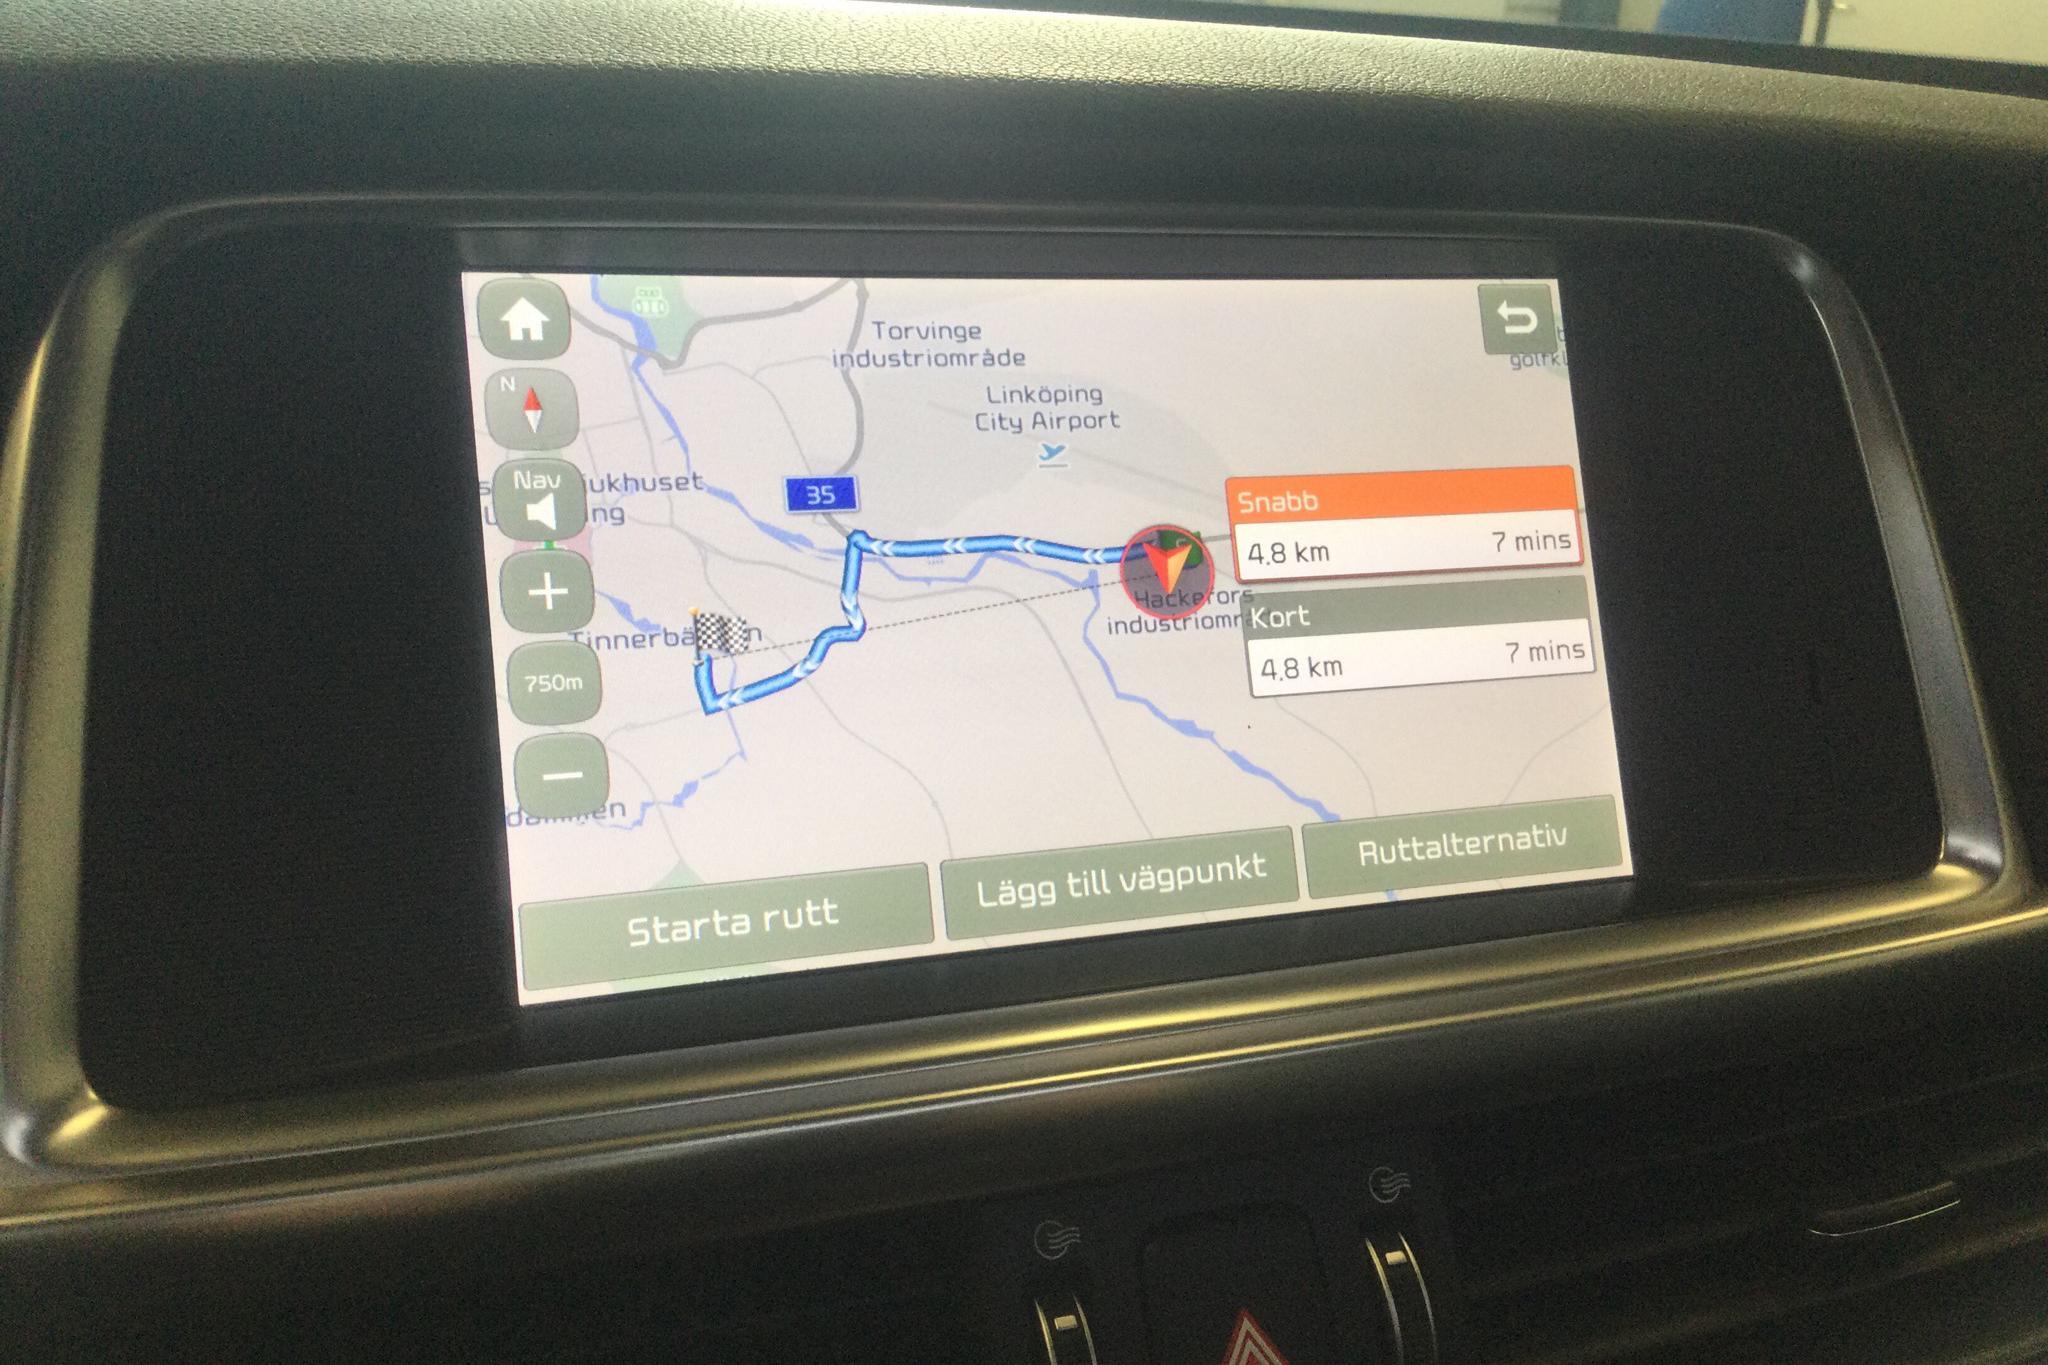 KIA Optima 2.0 GDi Plug-in Hybrid SW (205hk) - 79 440 km - Automatic - black - 2018